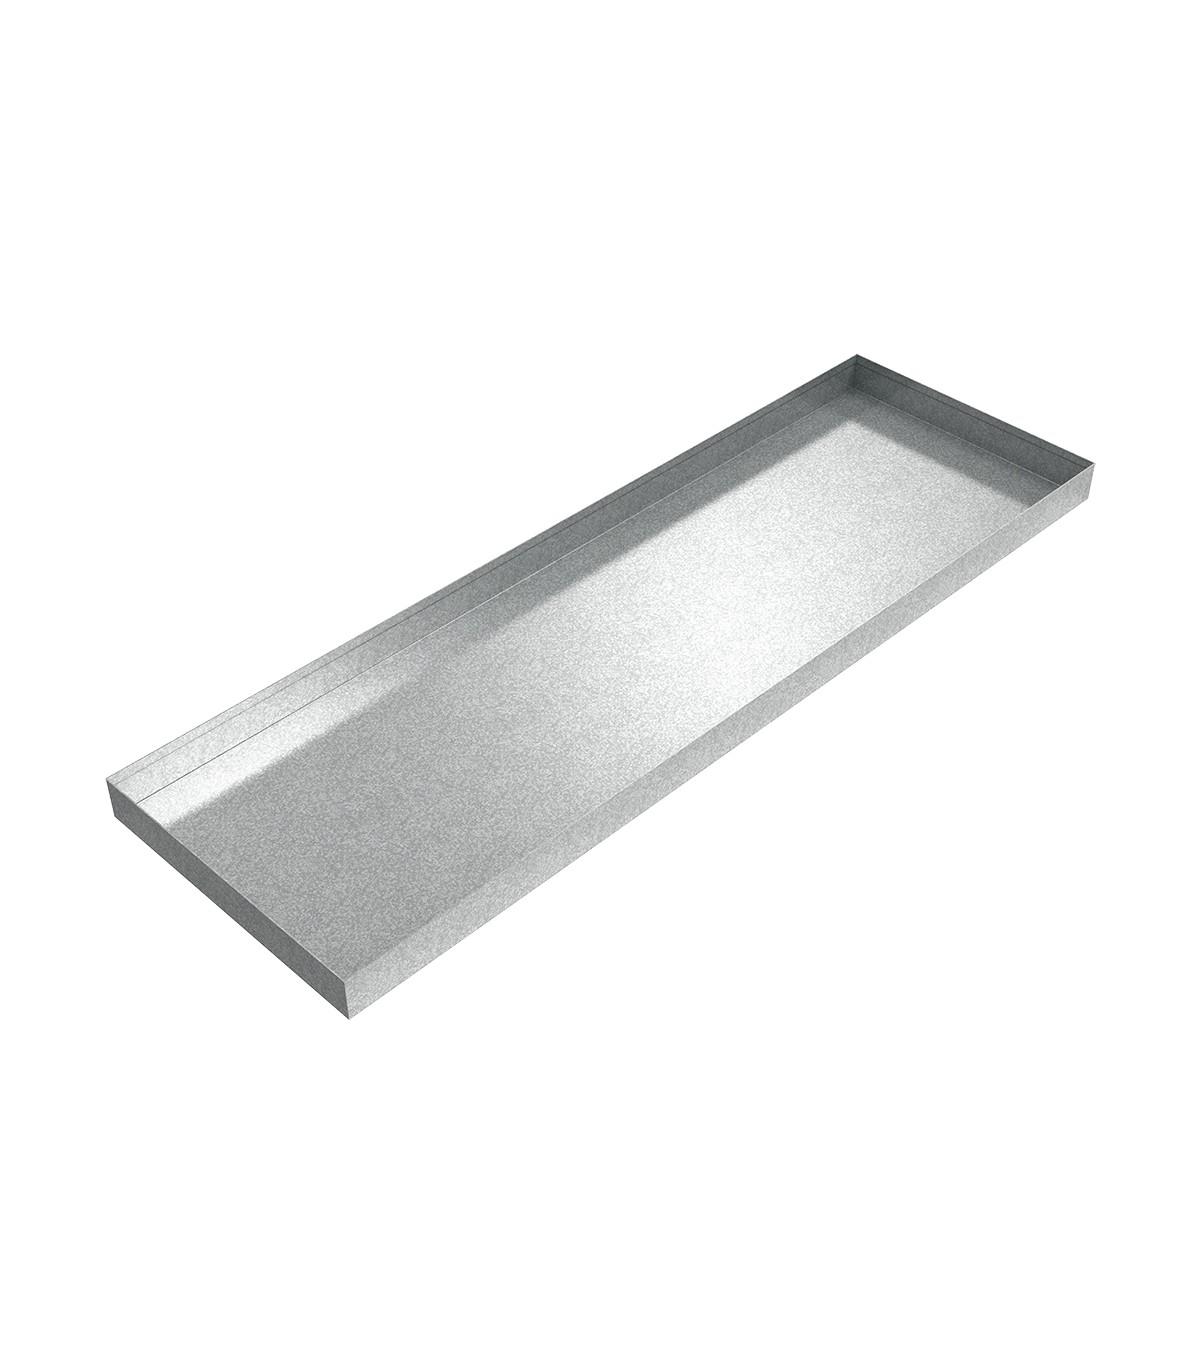 Galvanized Air Conditioner Tray